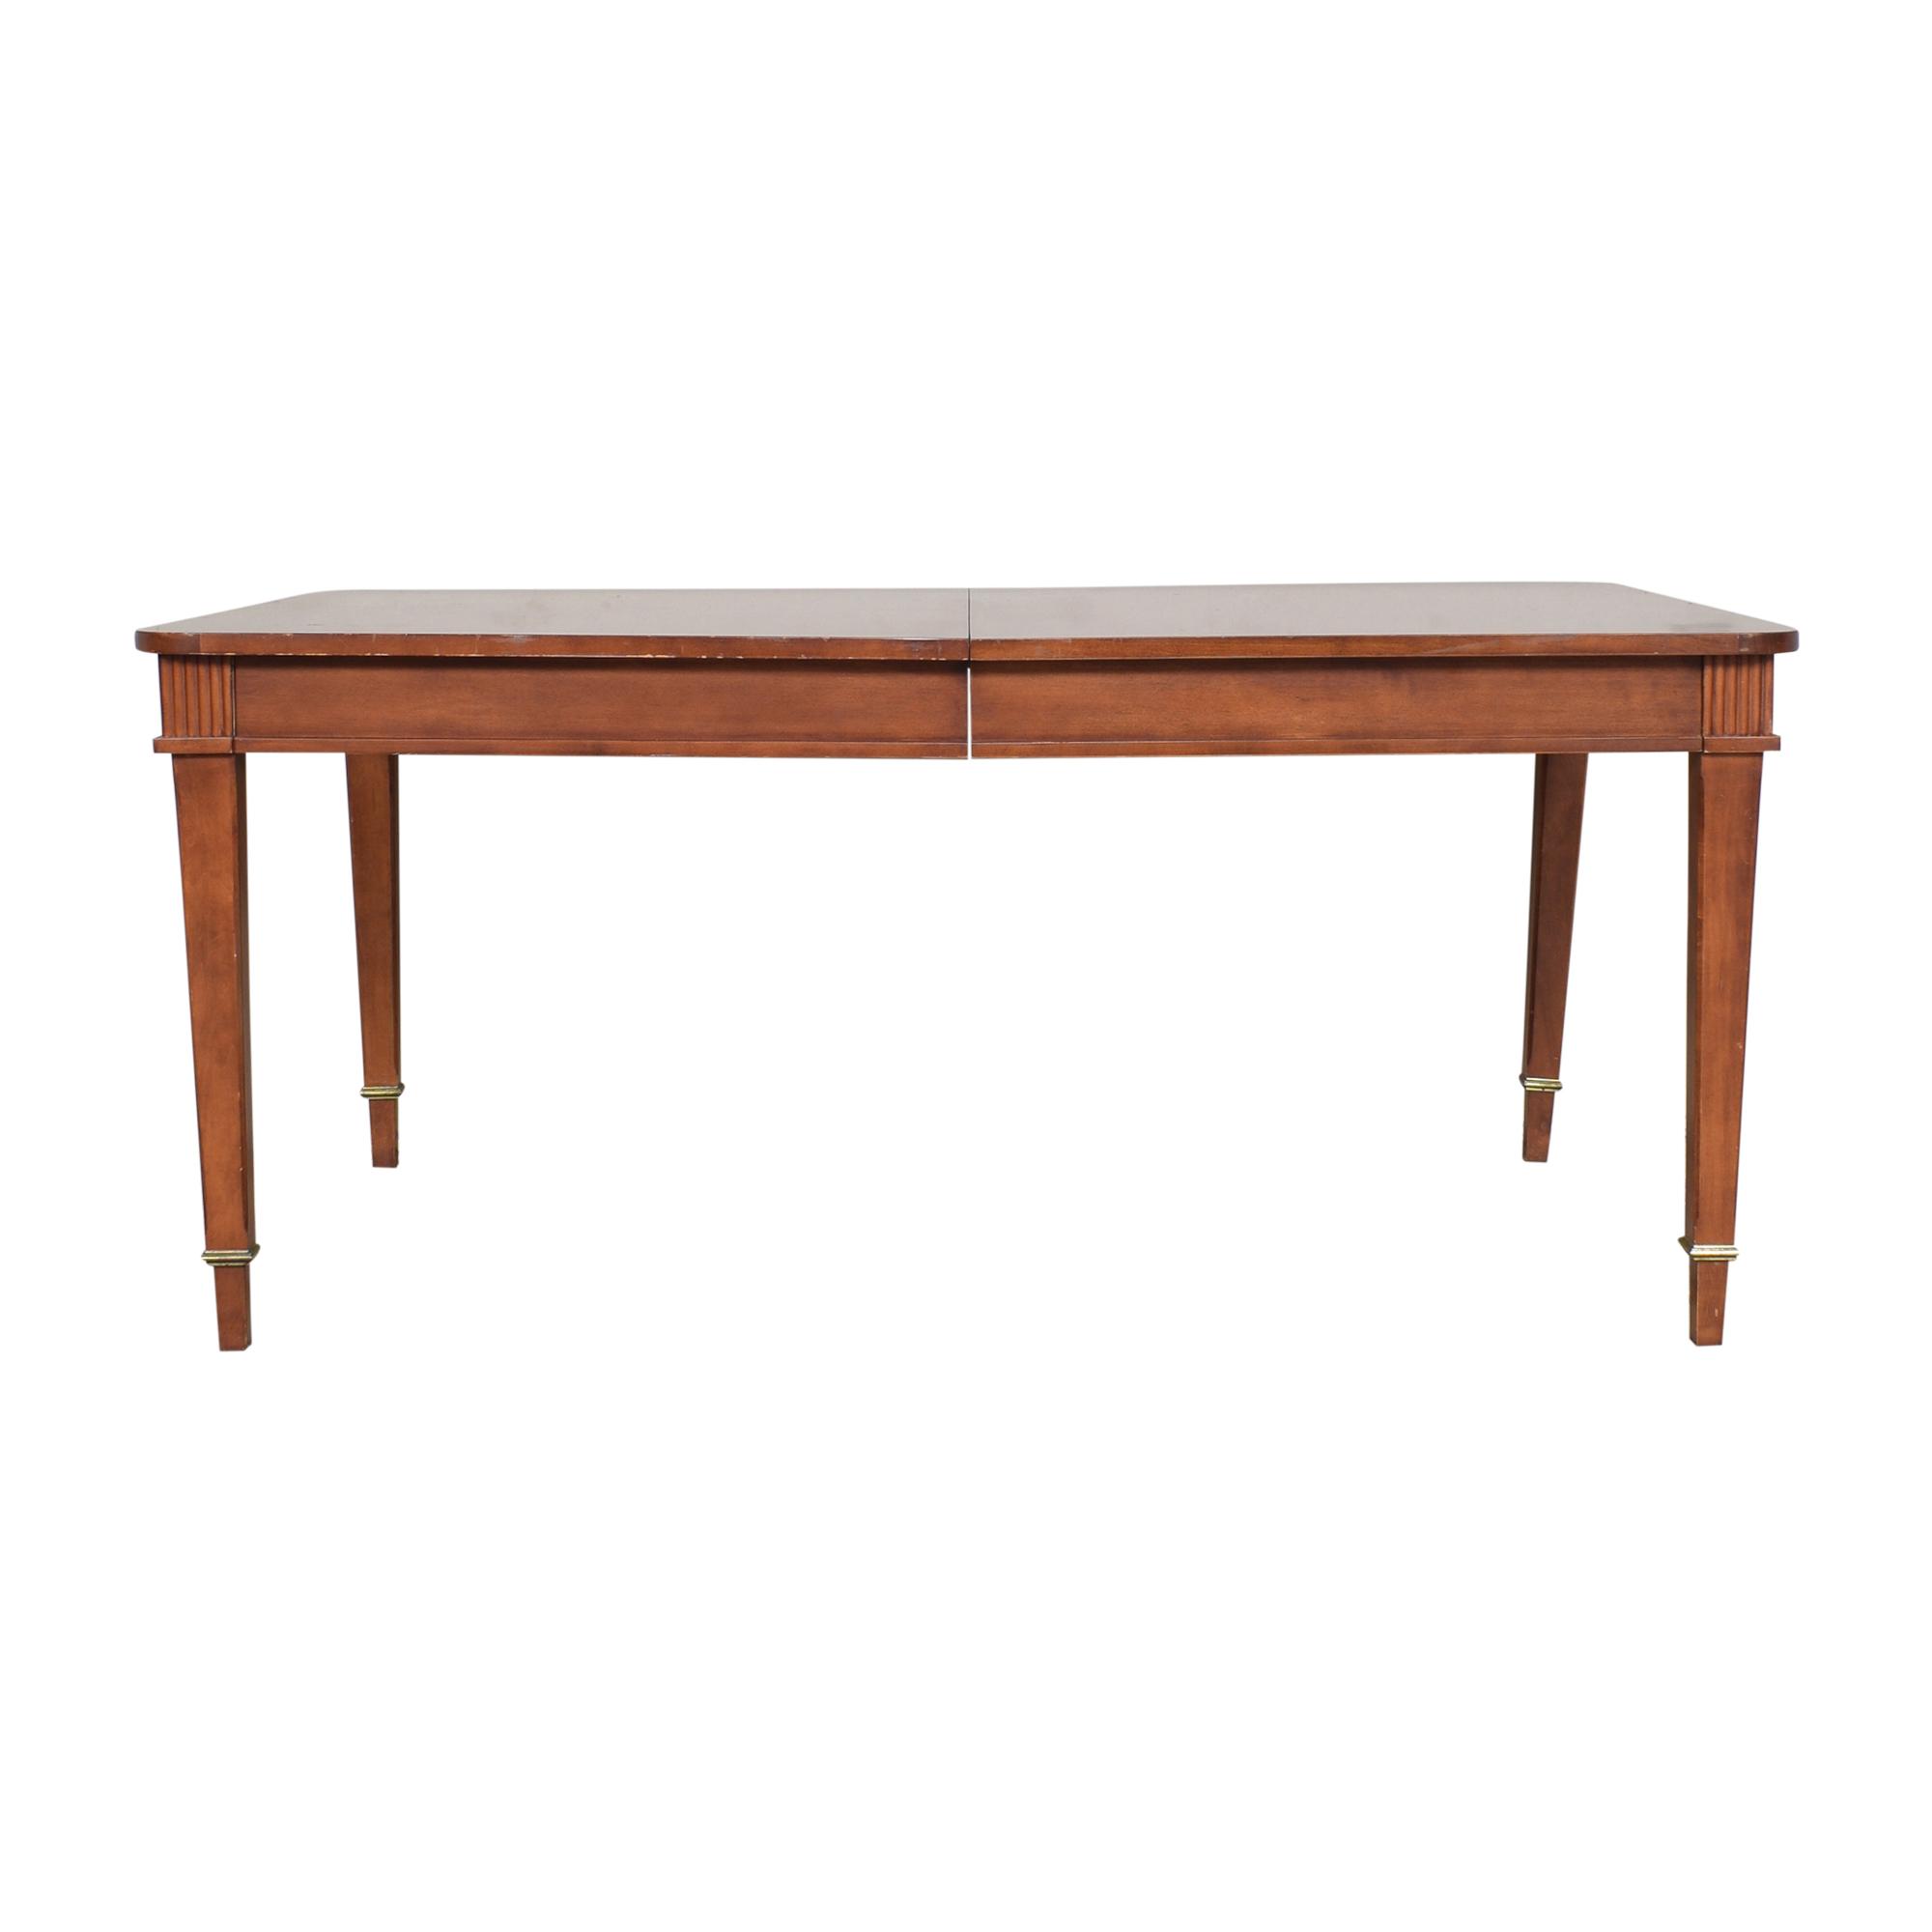 Thomasville Thomasville Extendable Dining Table ma